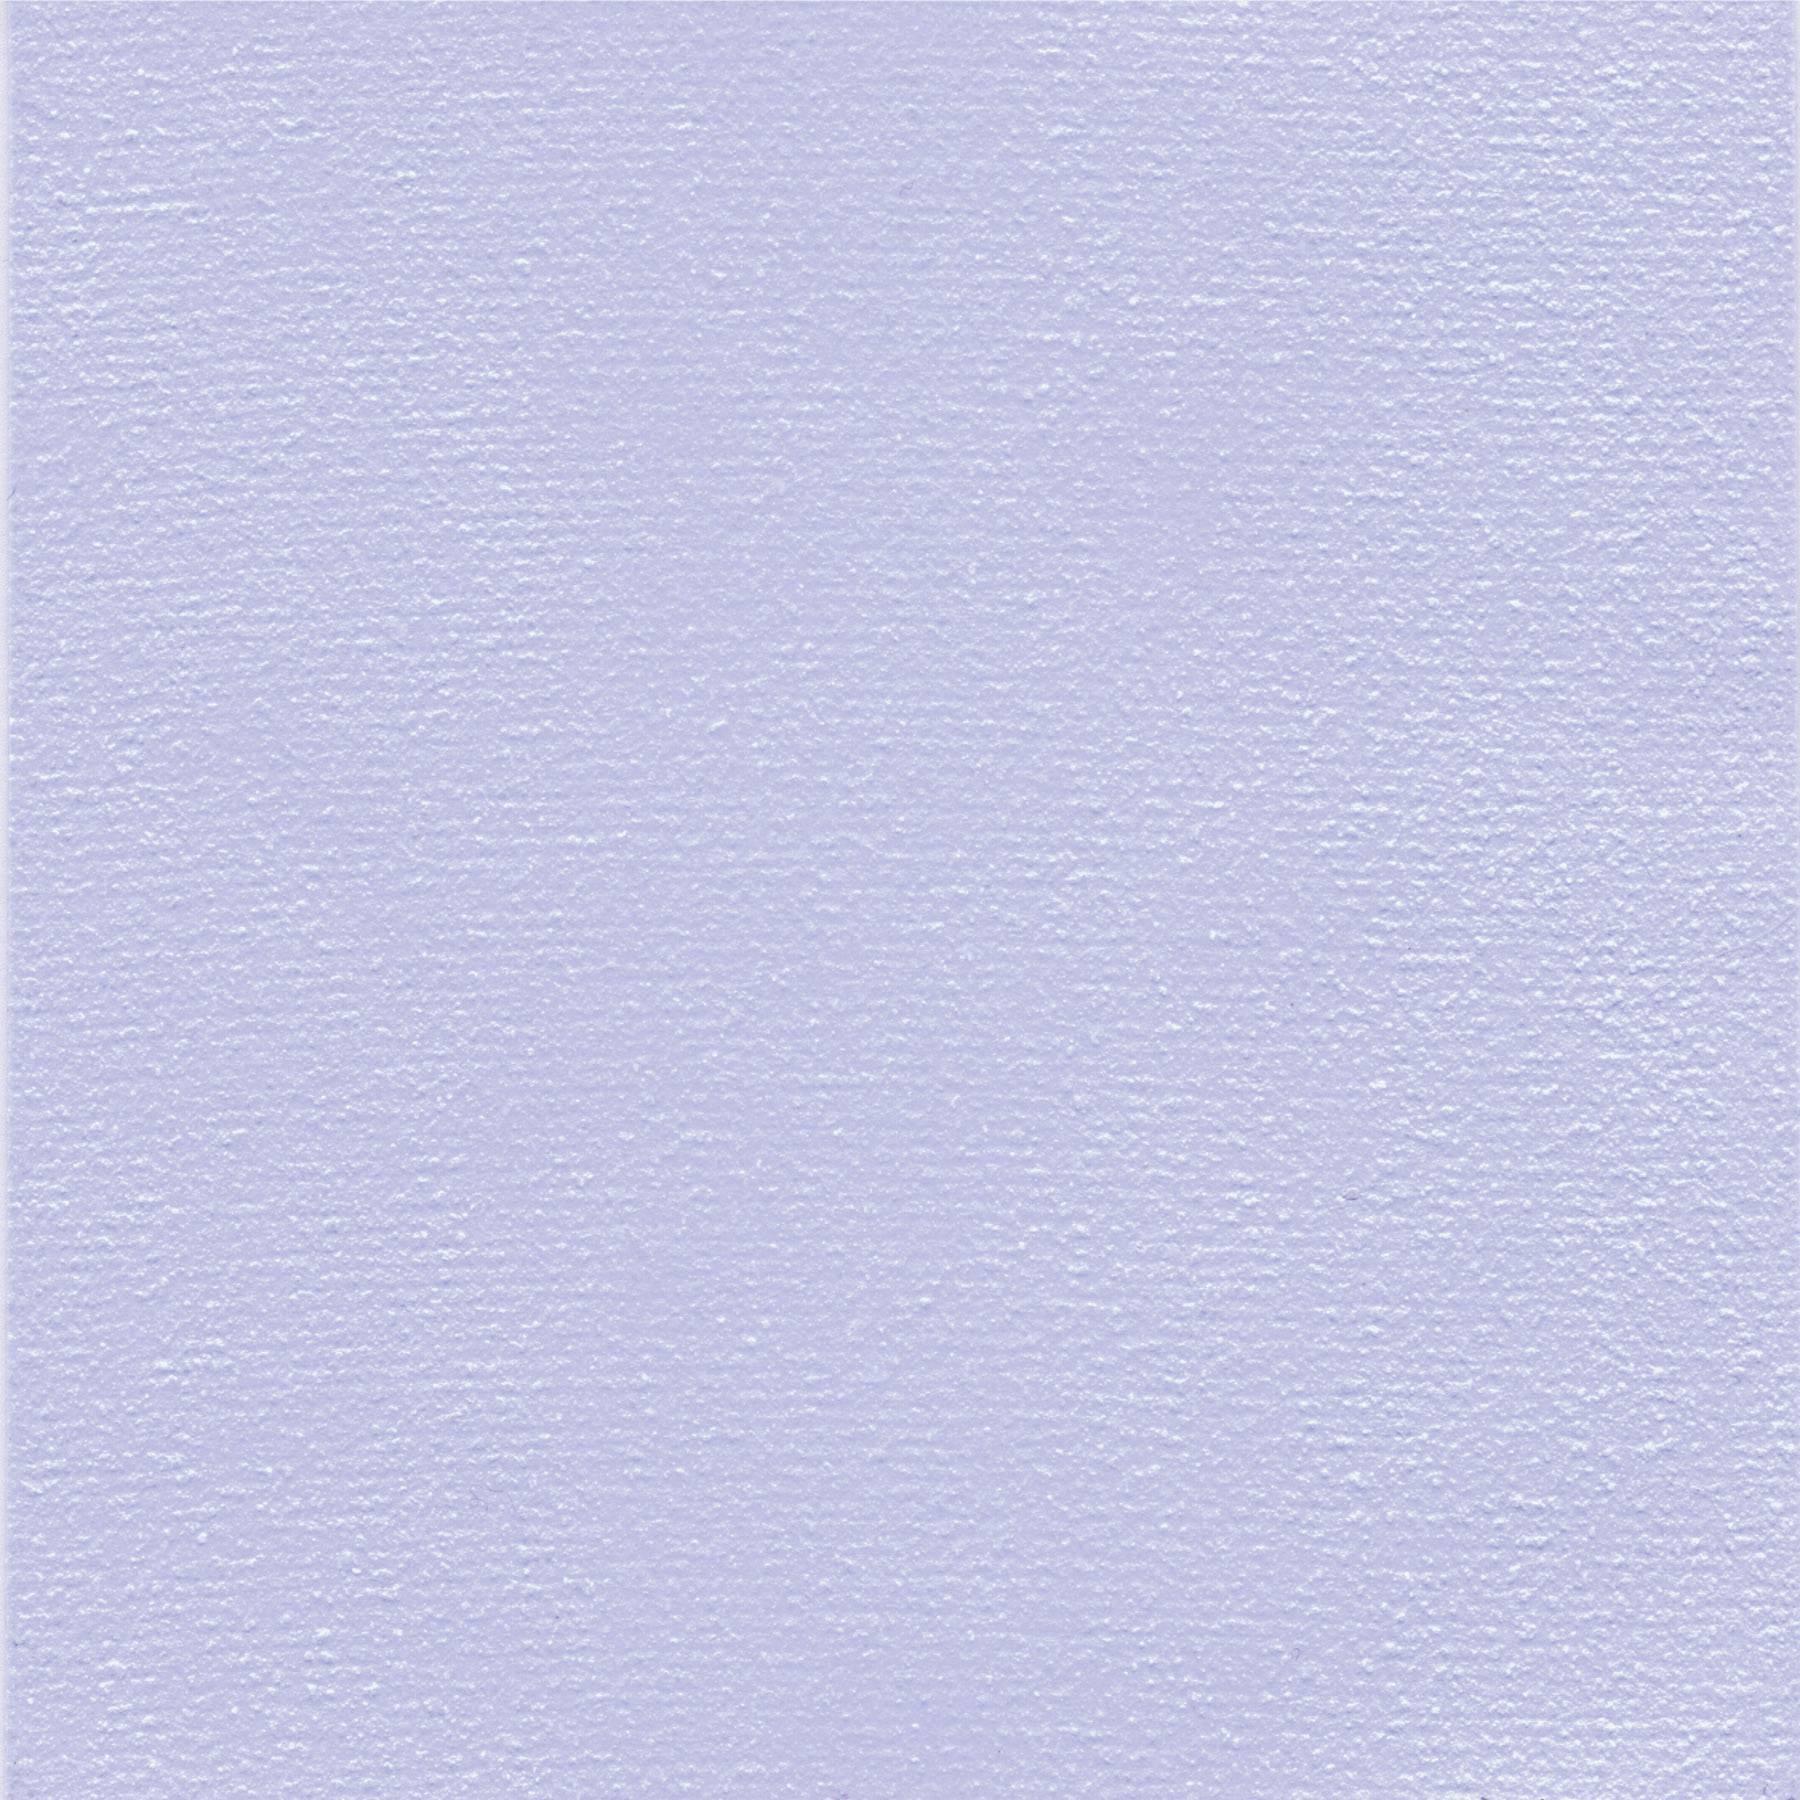 Teplovodivá fólia Kerafol SOFTTHERM 86/300, 5 mm, 3 W/mK, (d x š) 200 mm x 120 mm